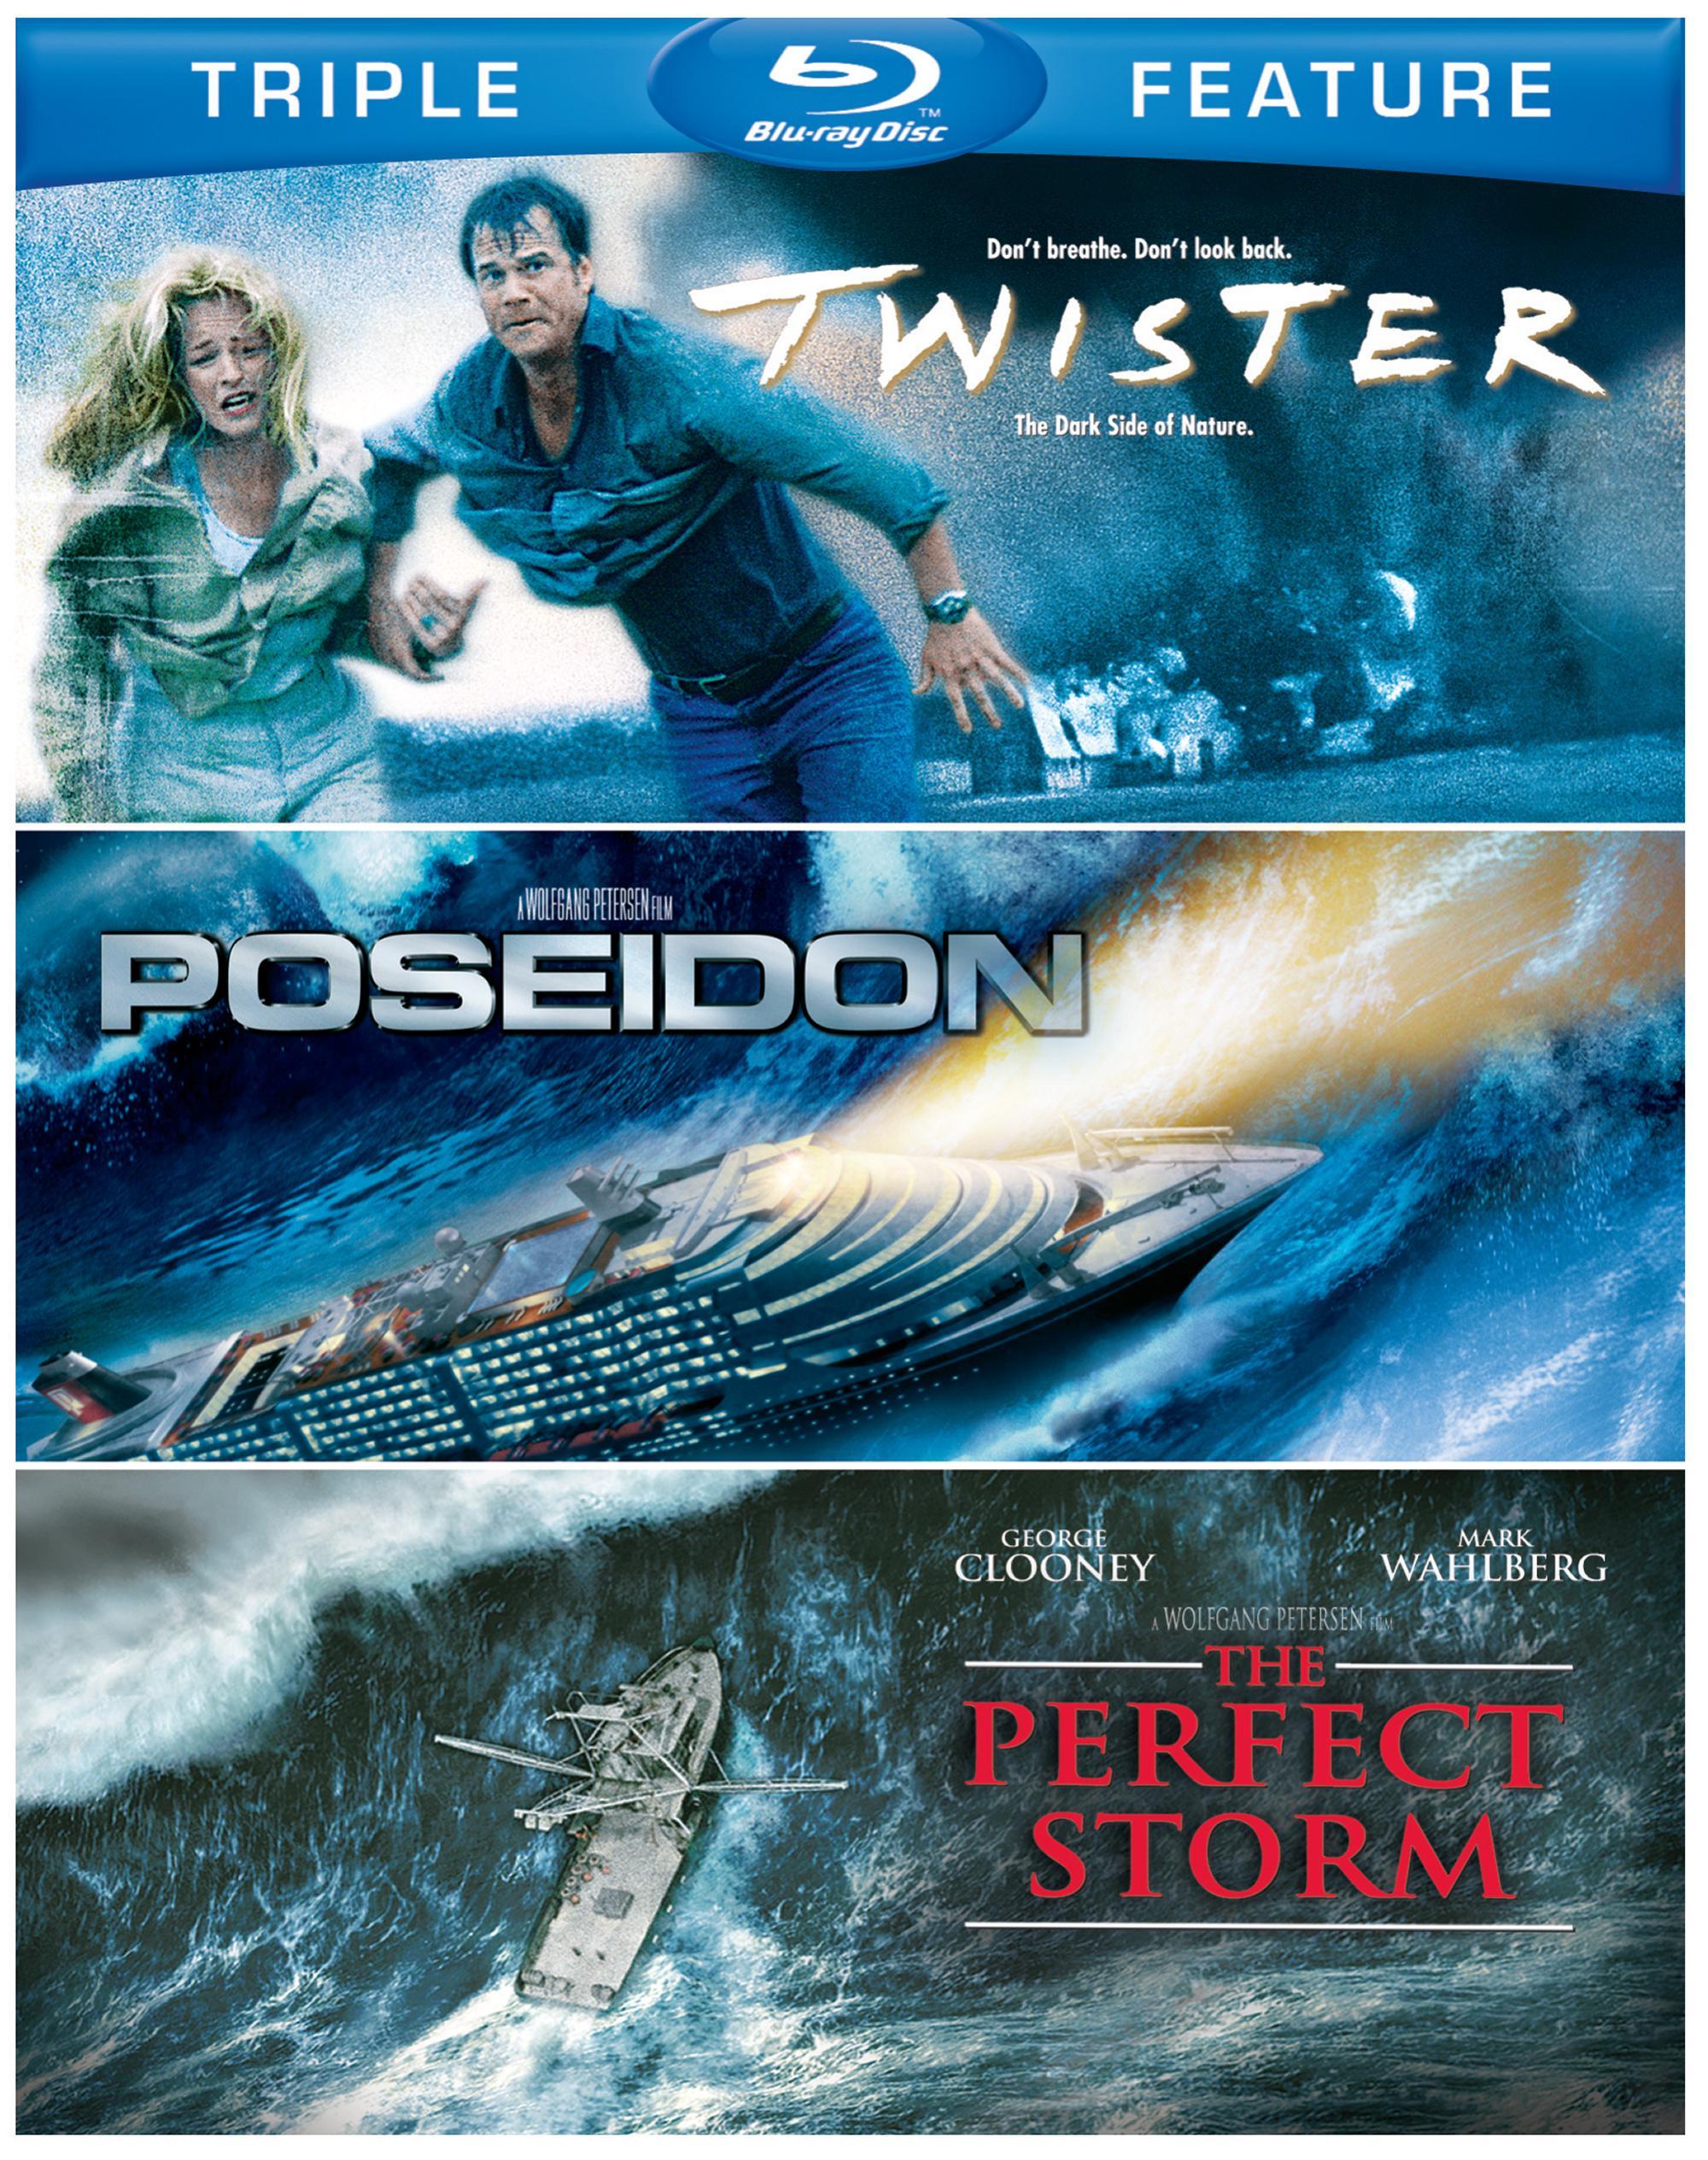 Twister/Poseidon/The Perfect Storm (Blu-ray Disc)